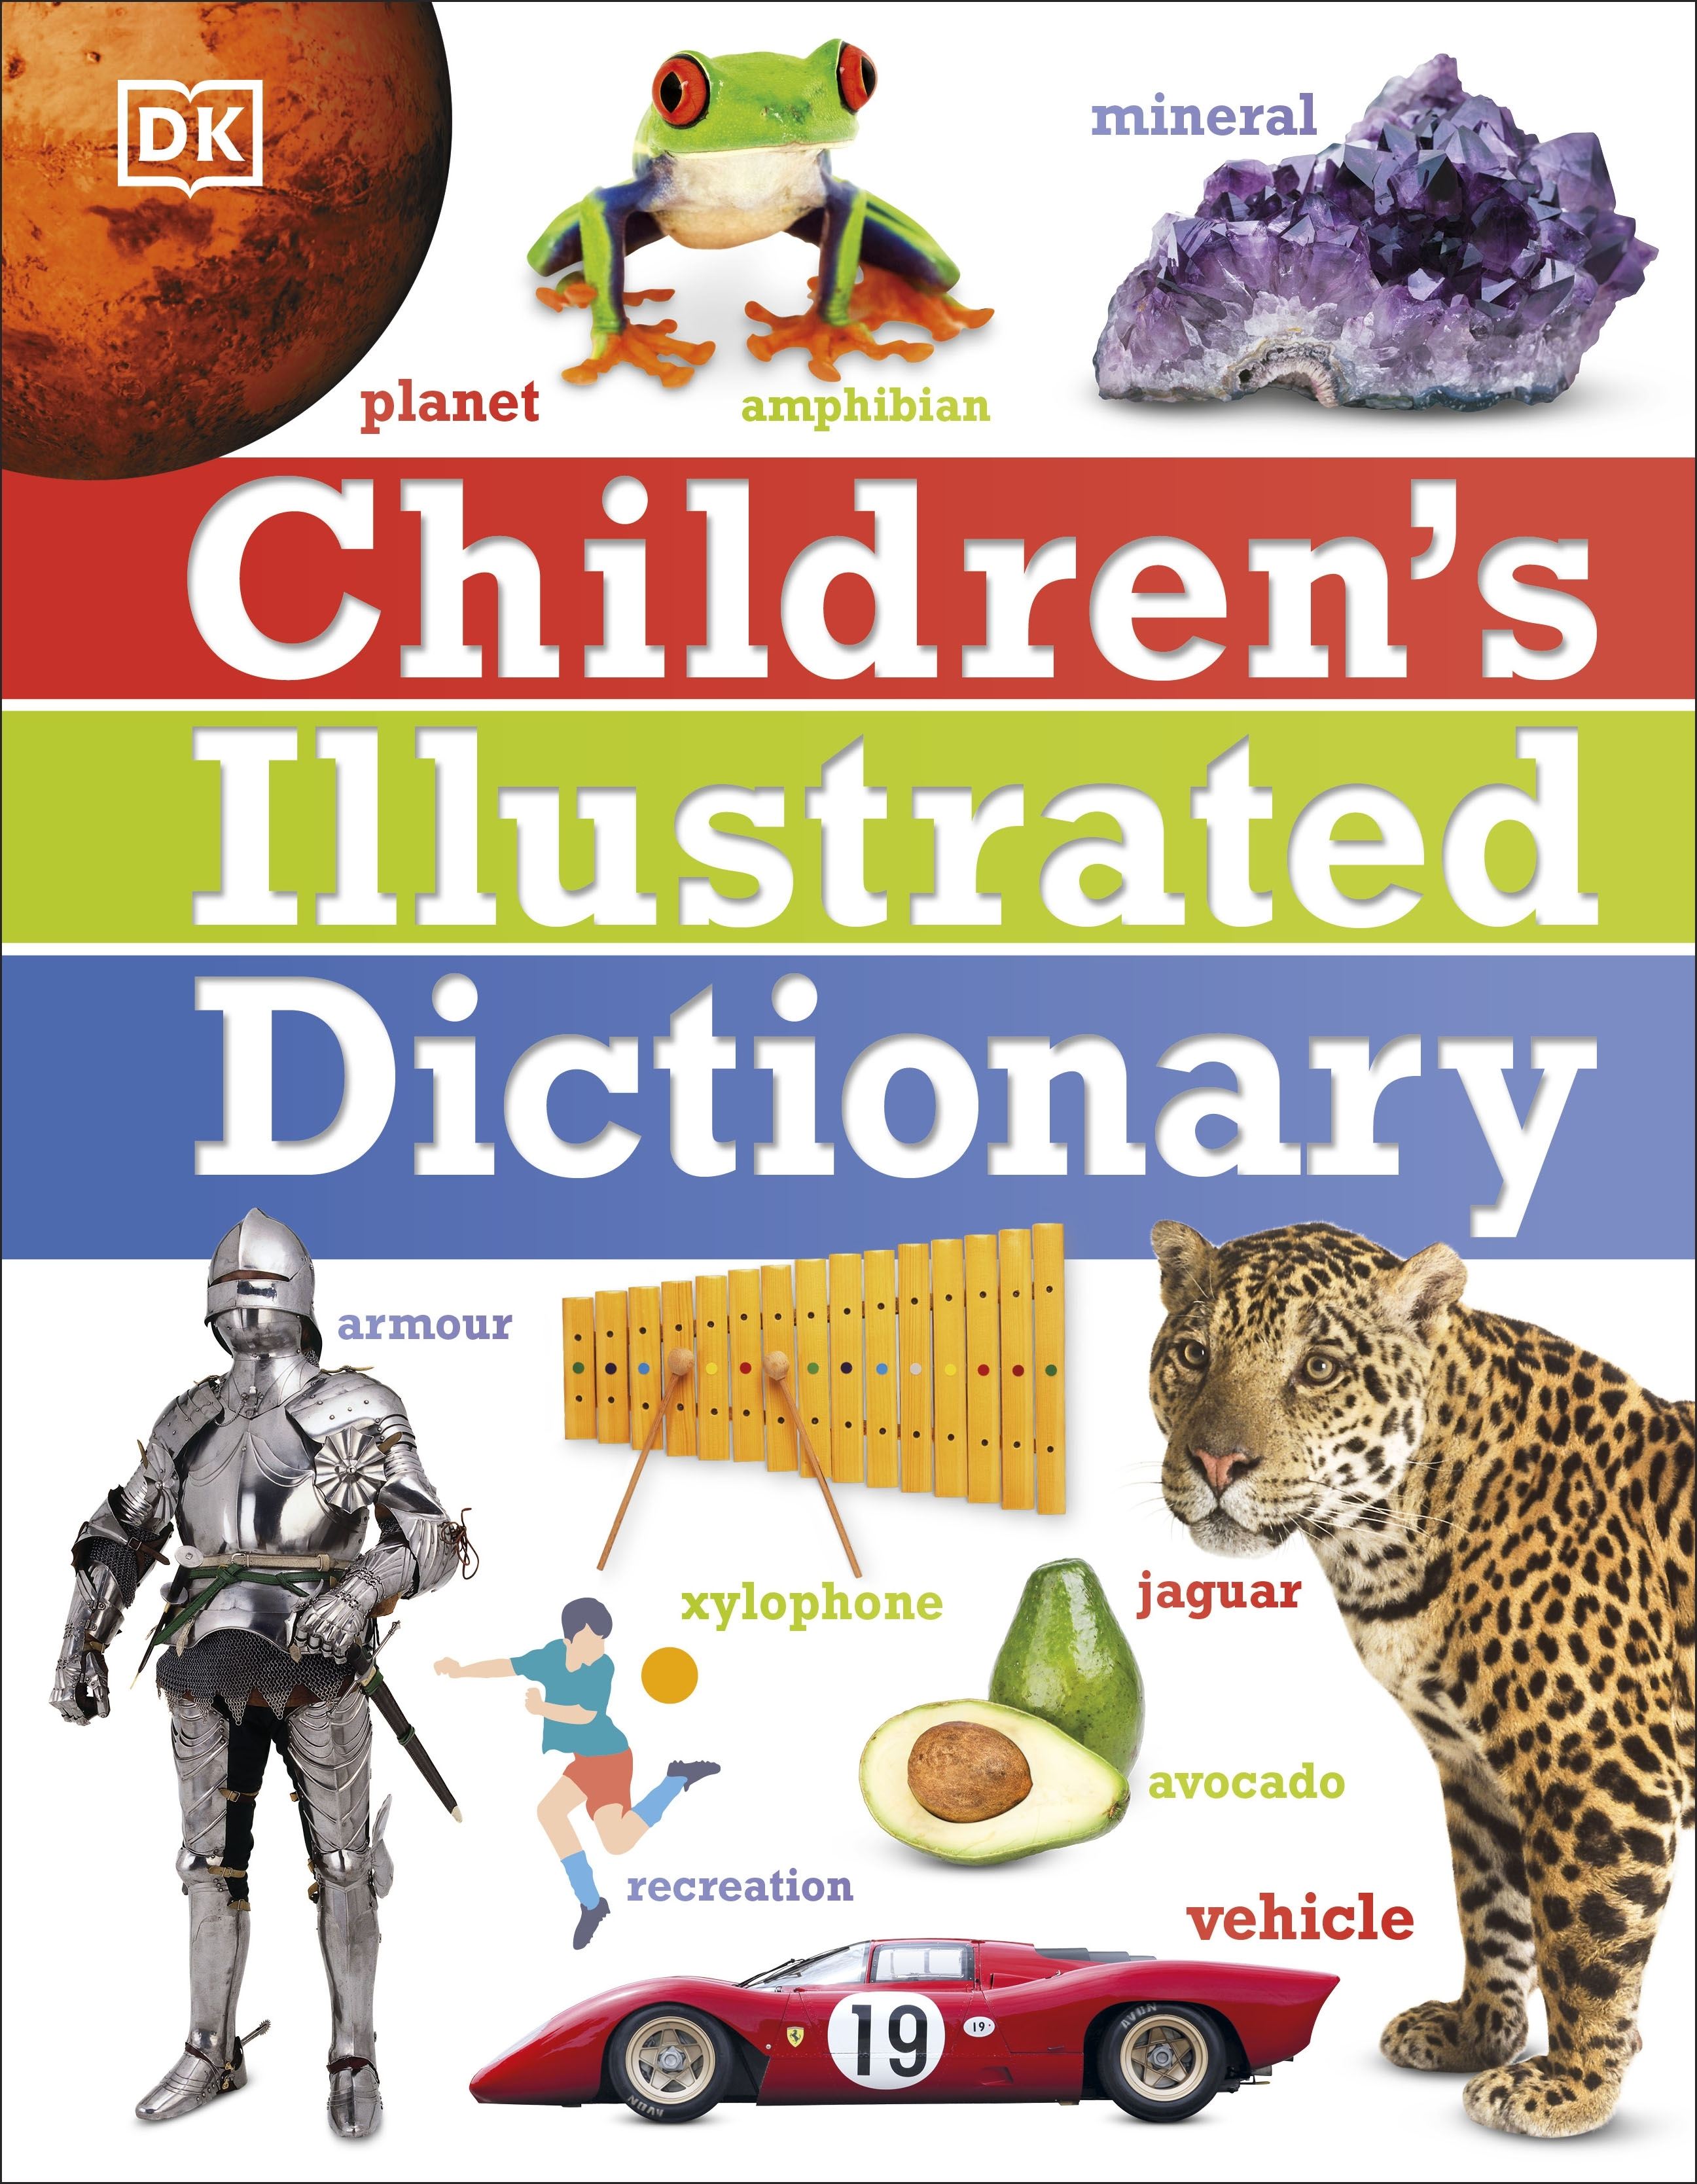 Children's Illustrated Dictionary | Penguin Books Australia